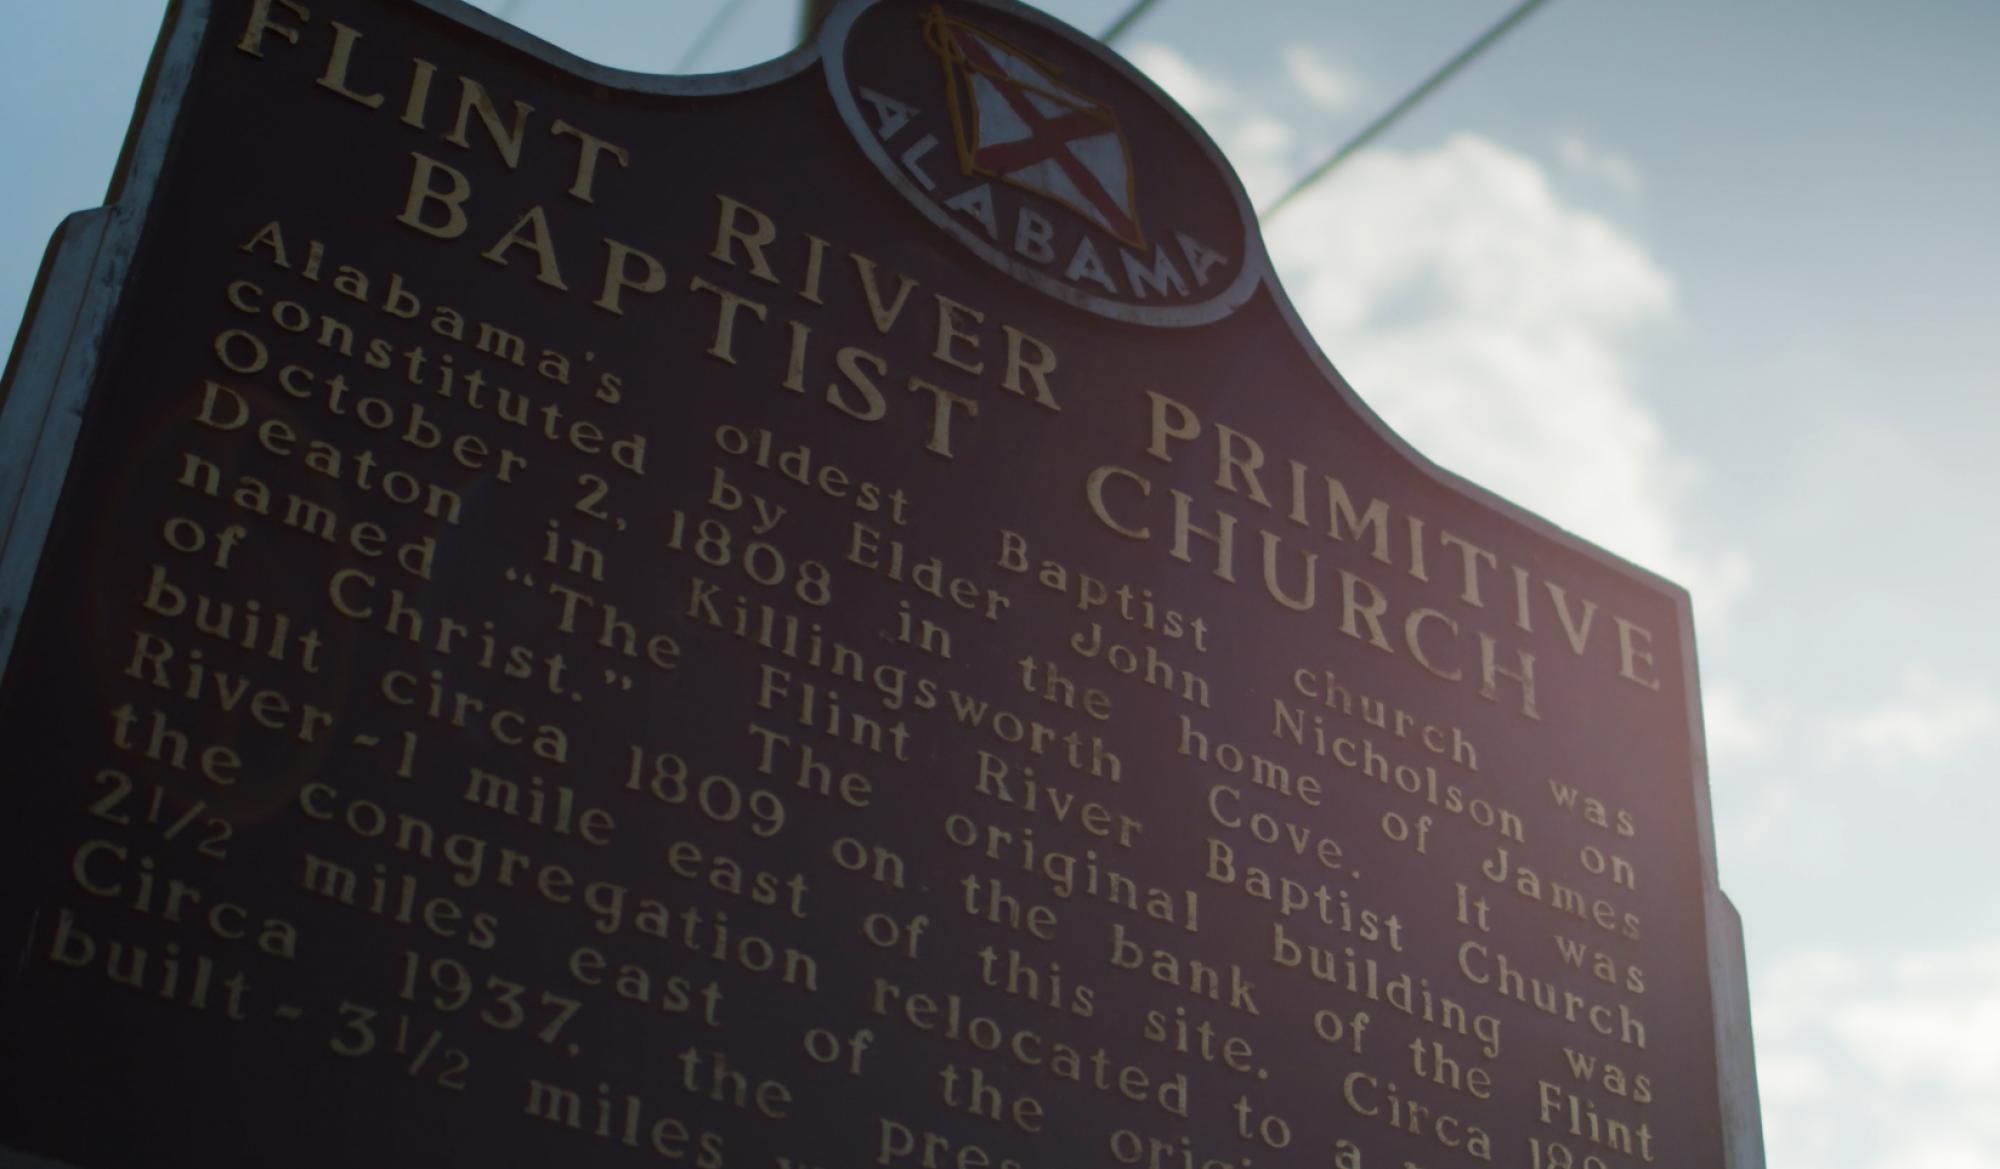 Flint River Primitive Baptist Church